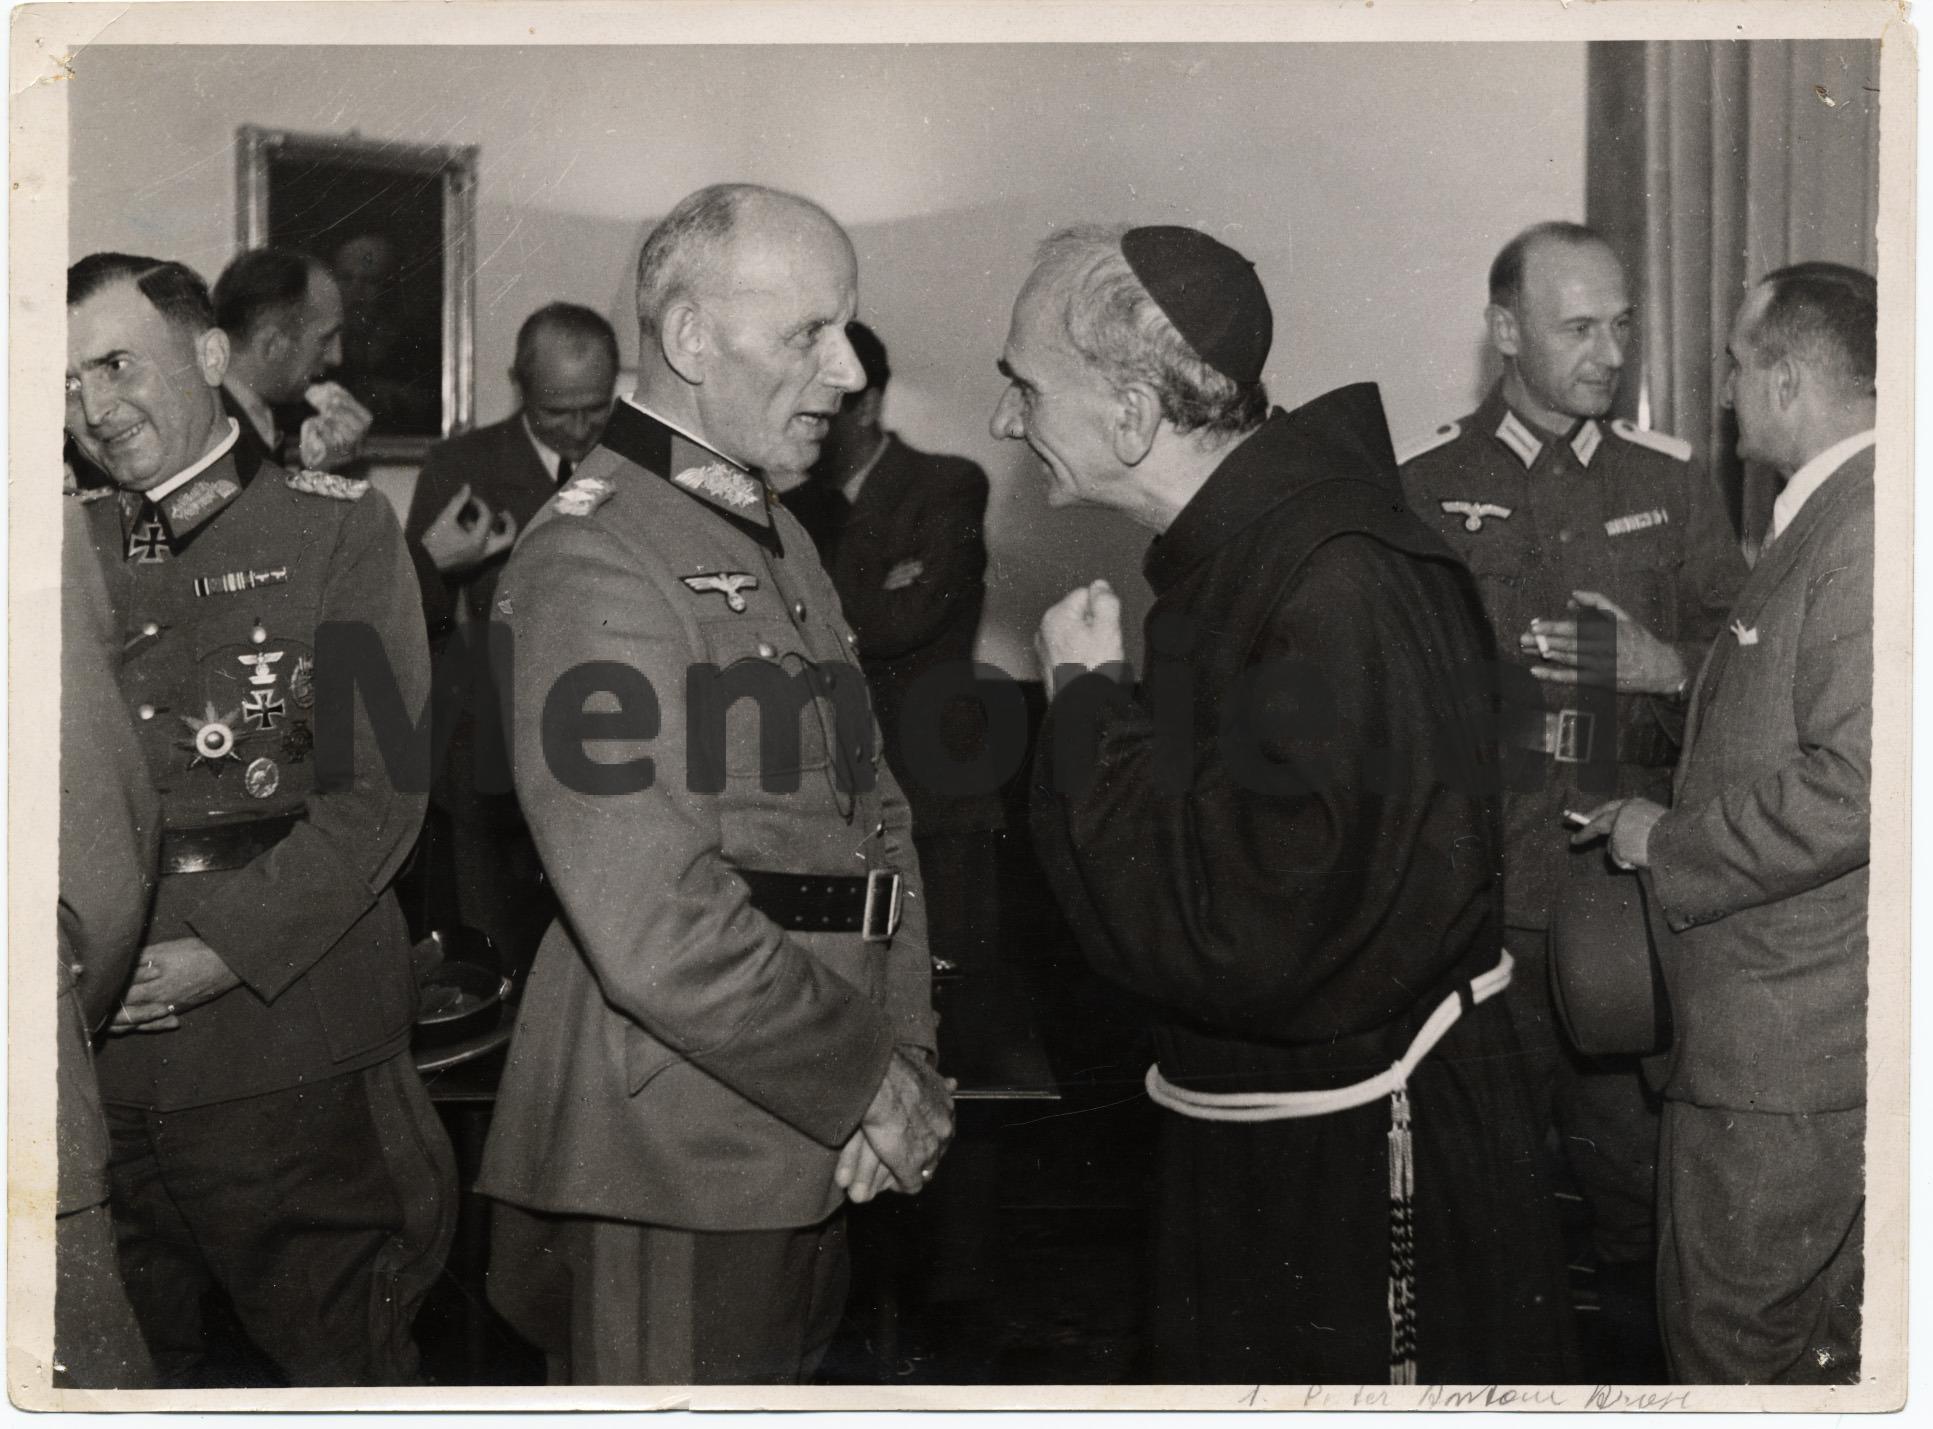 Pater-Anton-Harapi-me-gjermanet